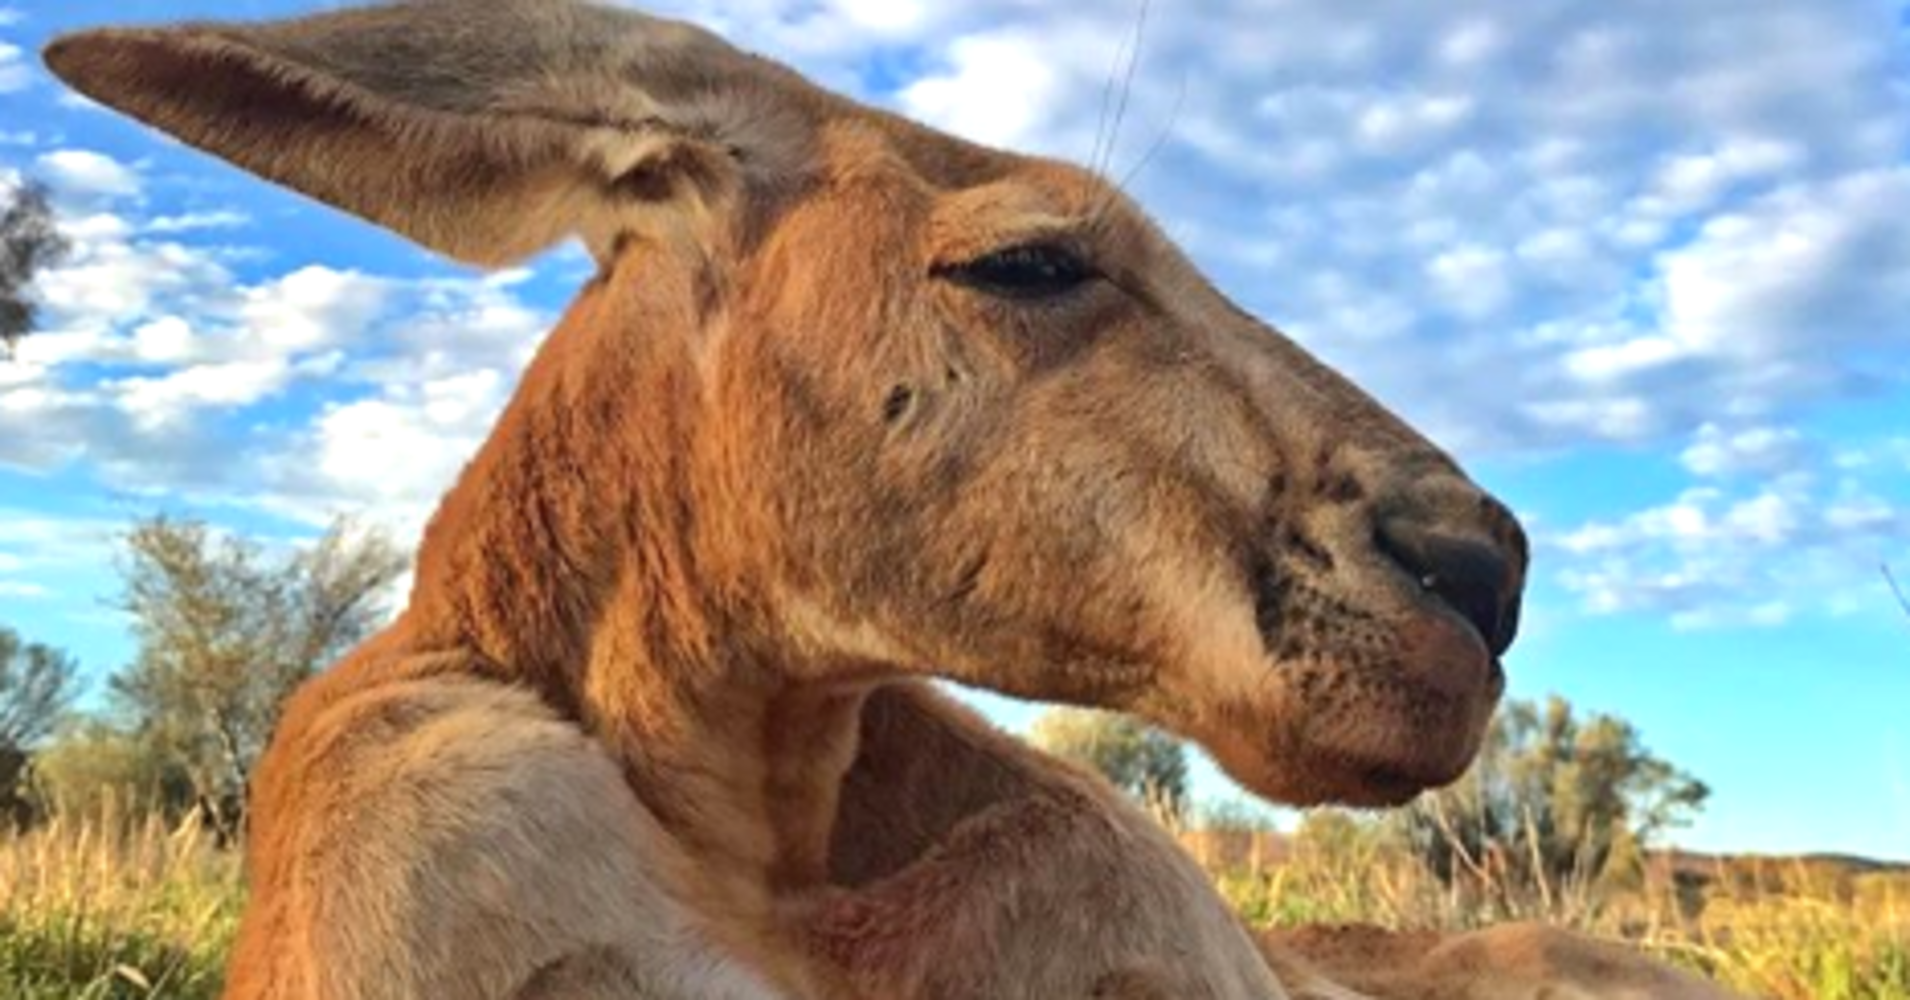 Roger, The Incredibly Buff Kangaroo, Has Died At Age 12